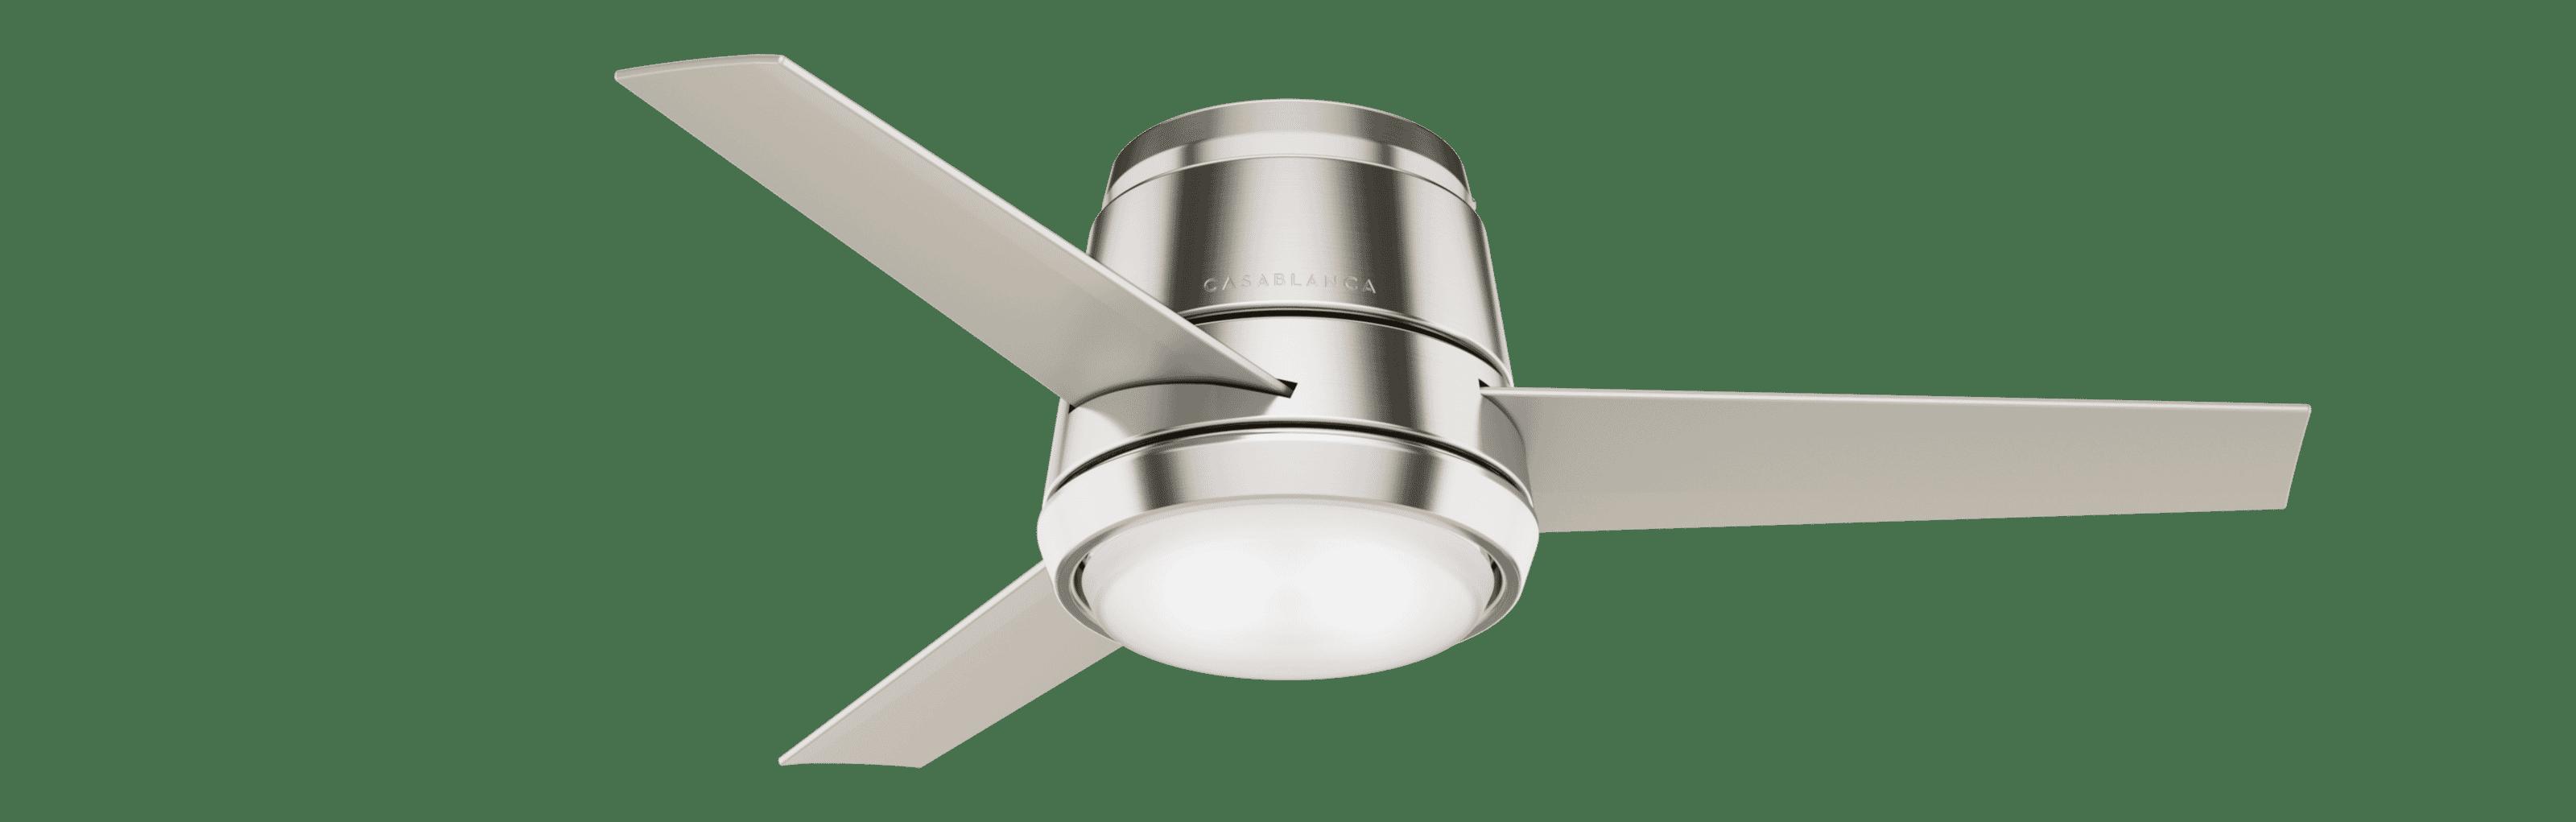 Casablanca Commodus 44 Indoor Ceiling Fan In Brushed Nickel